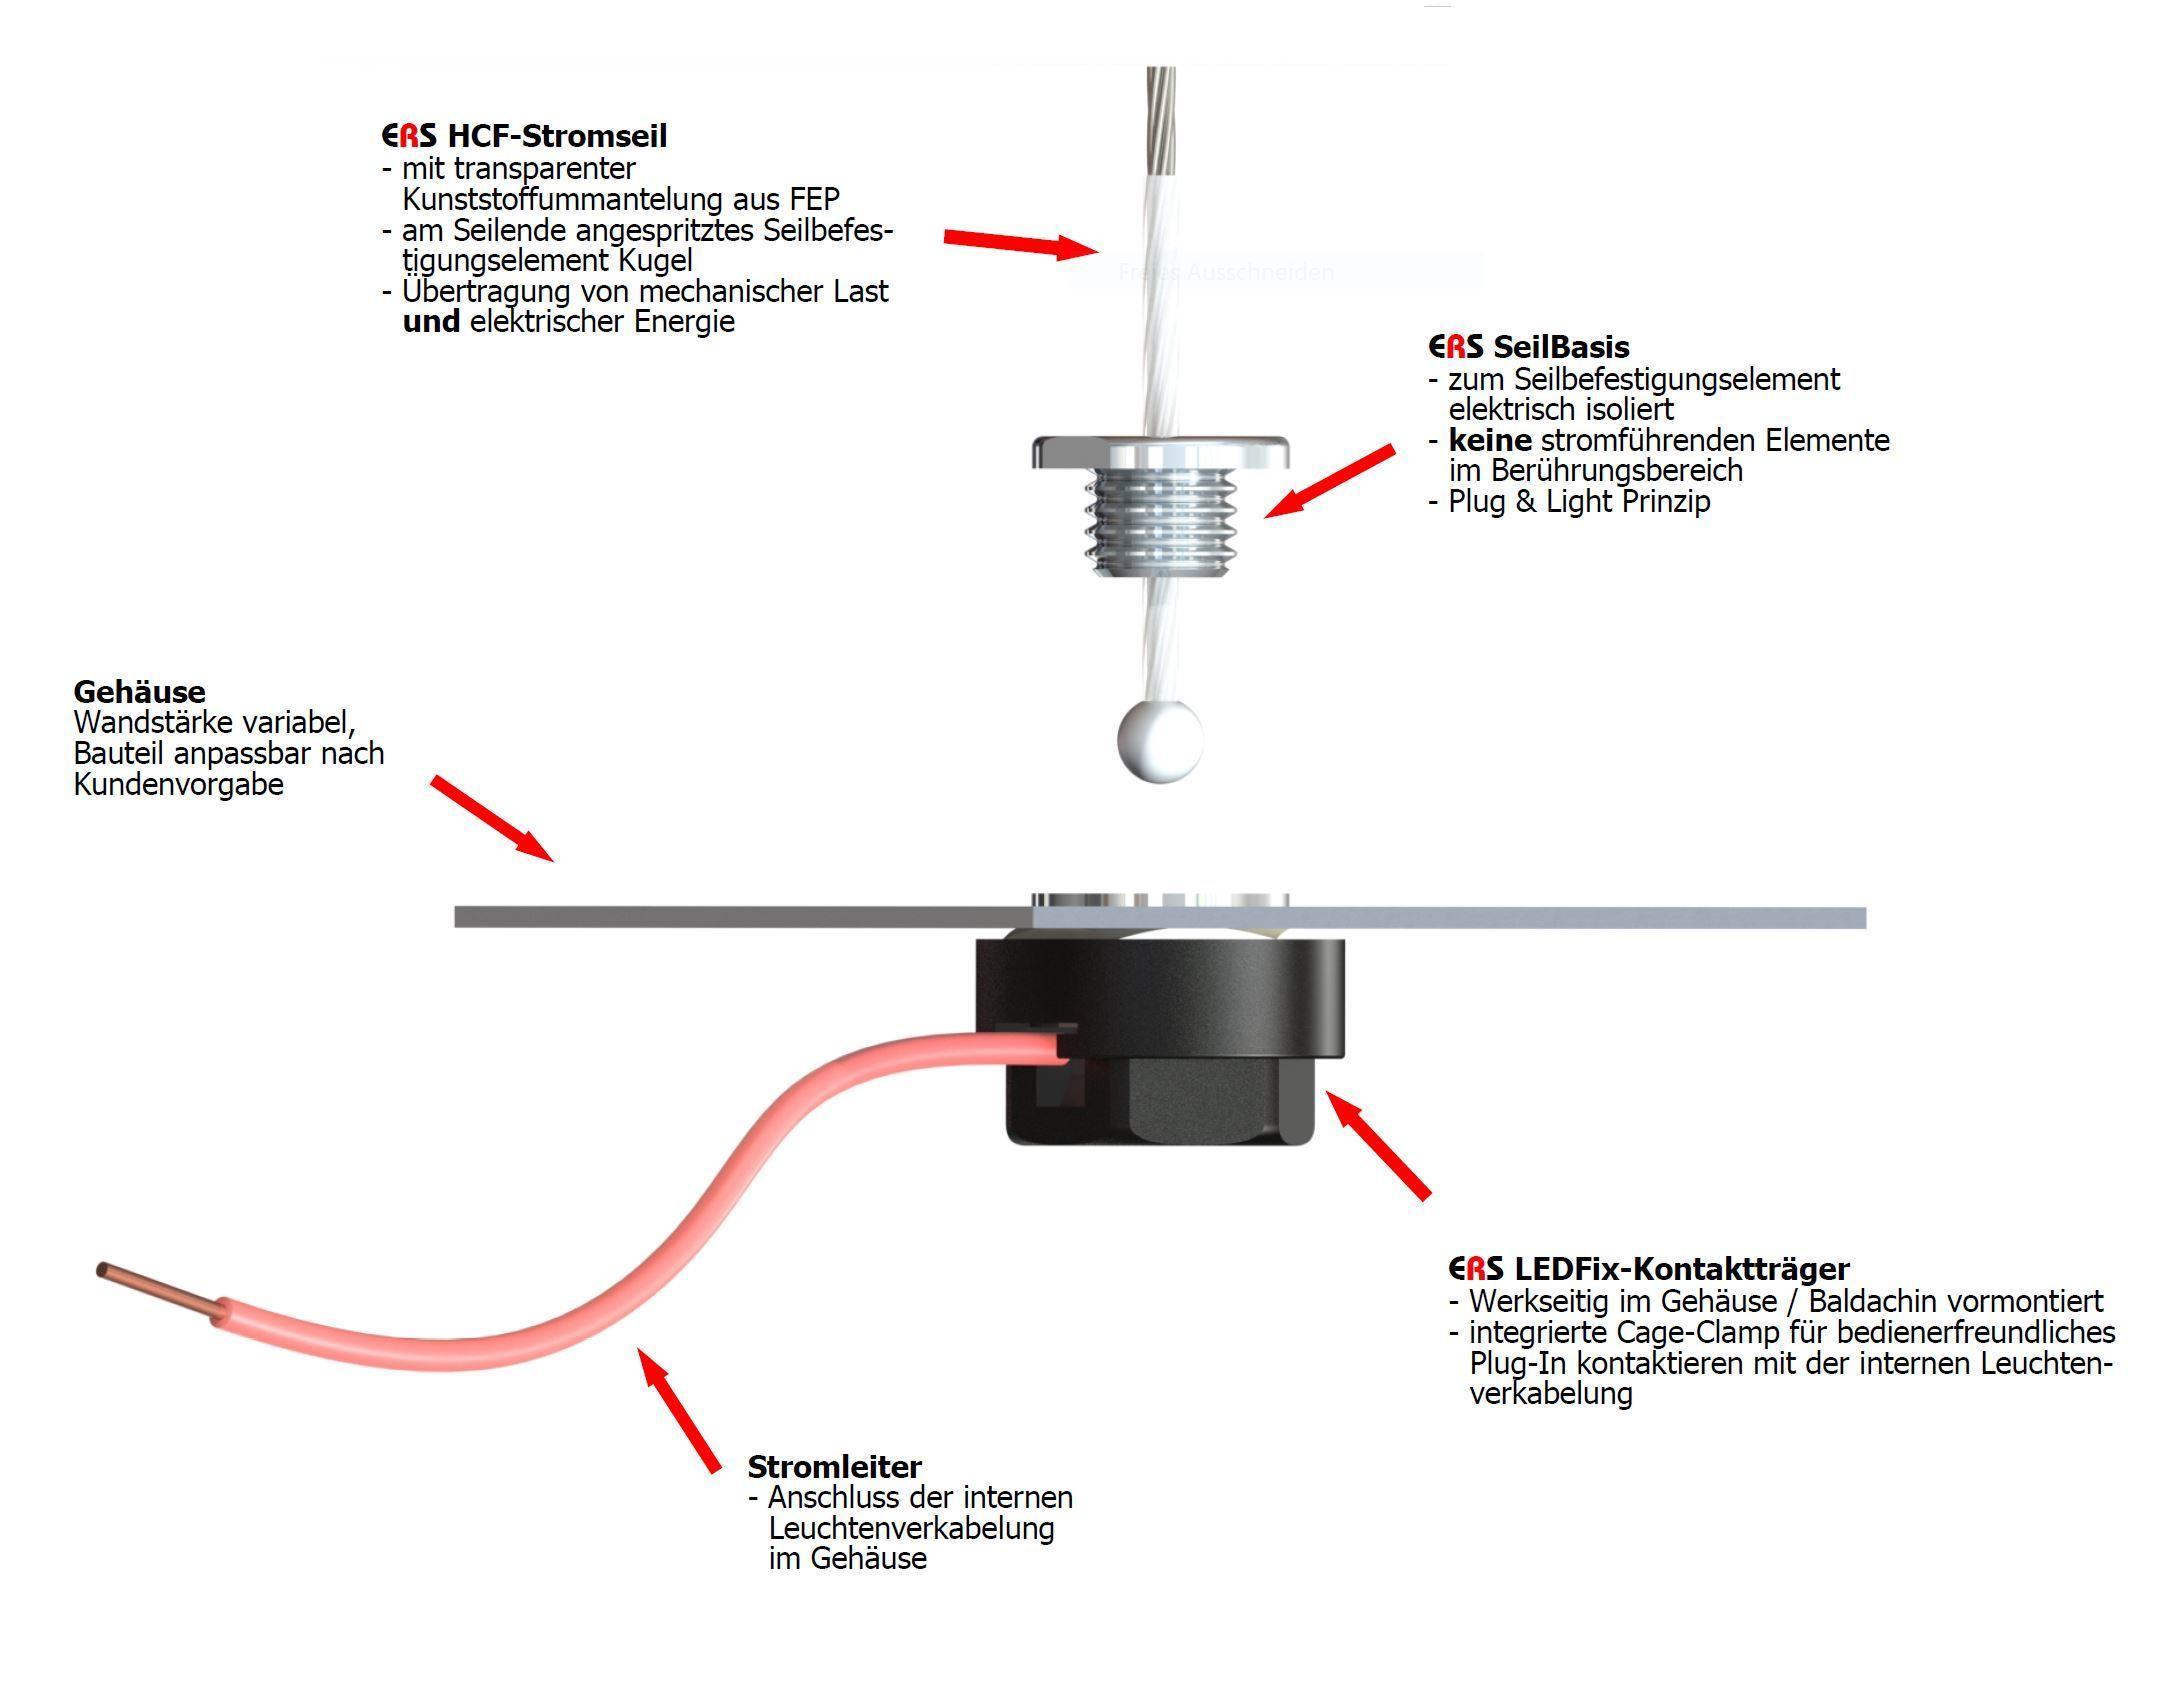 LEDFix – ERS EuRope-Systems GmbH